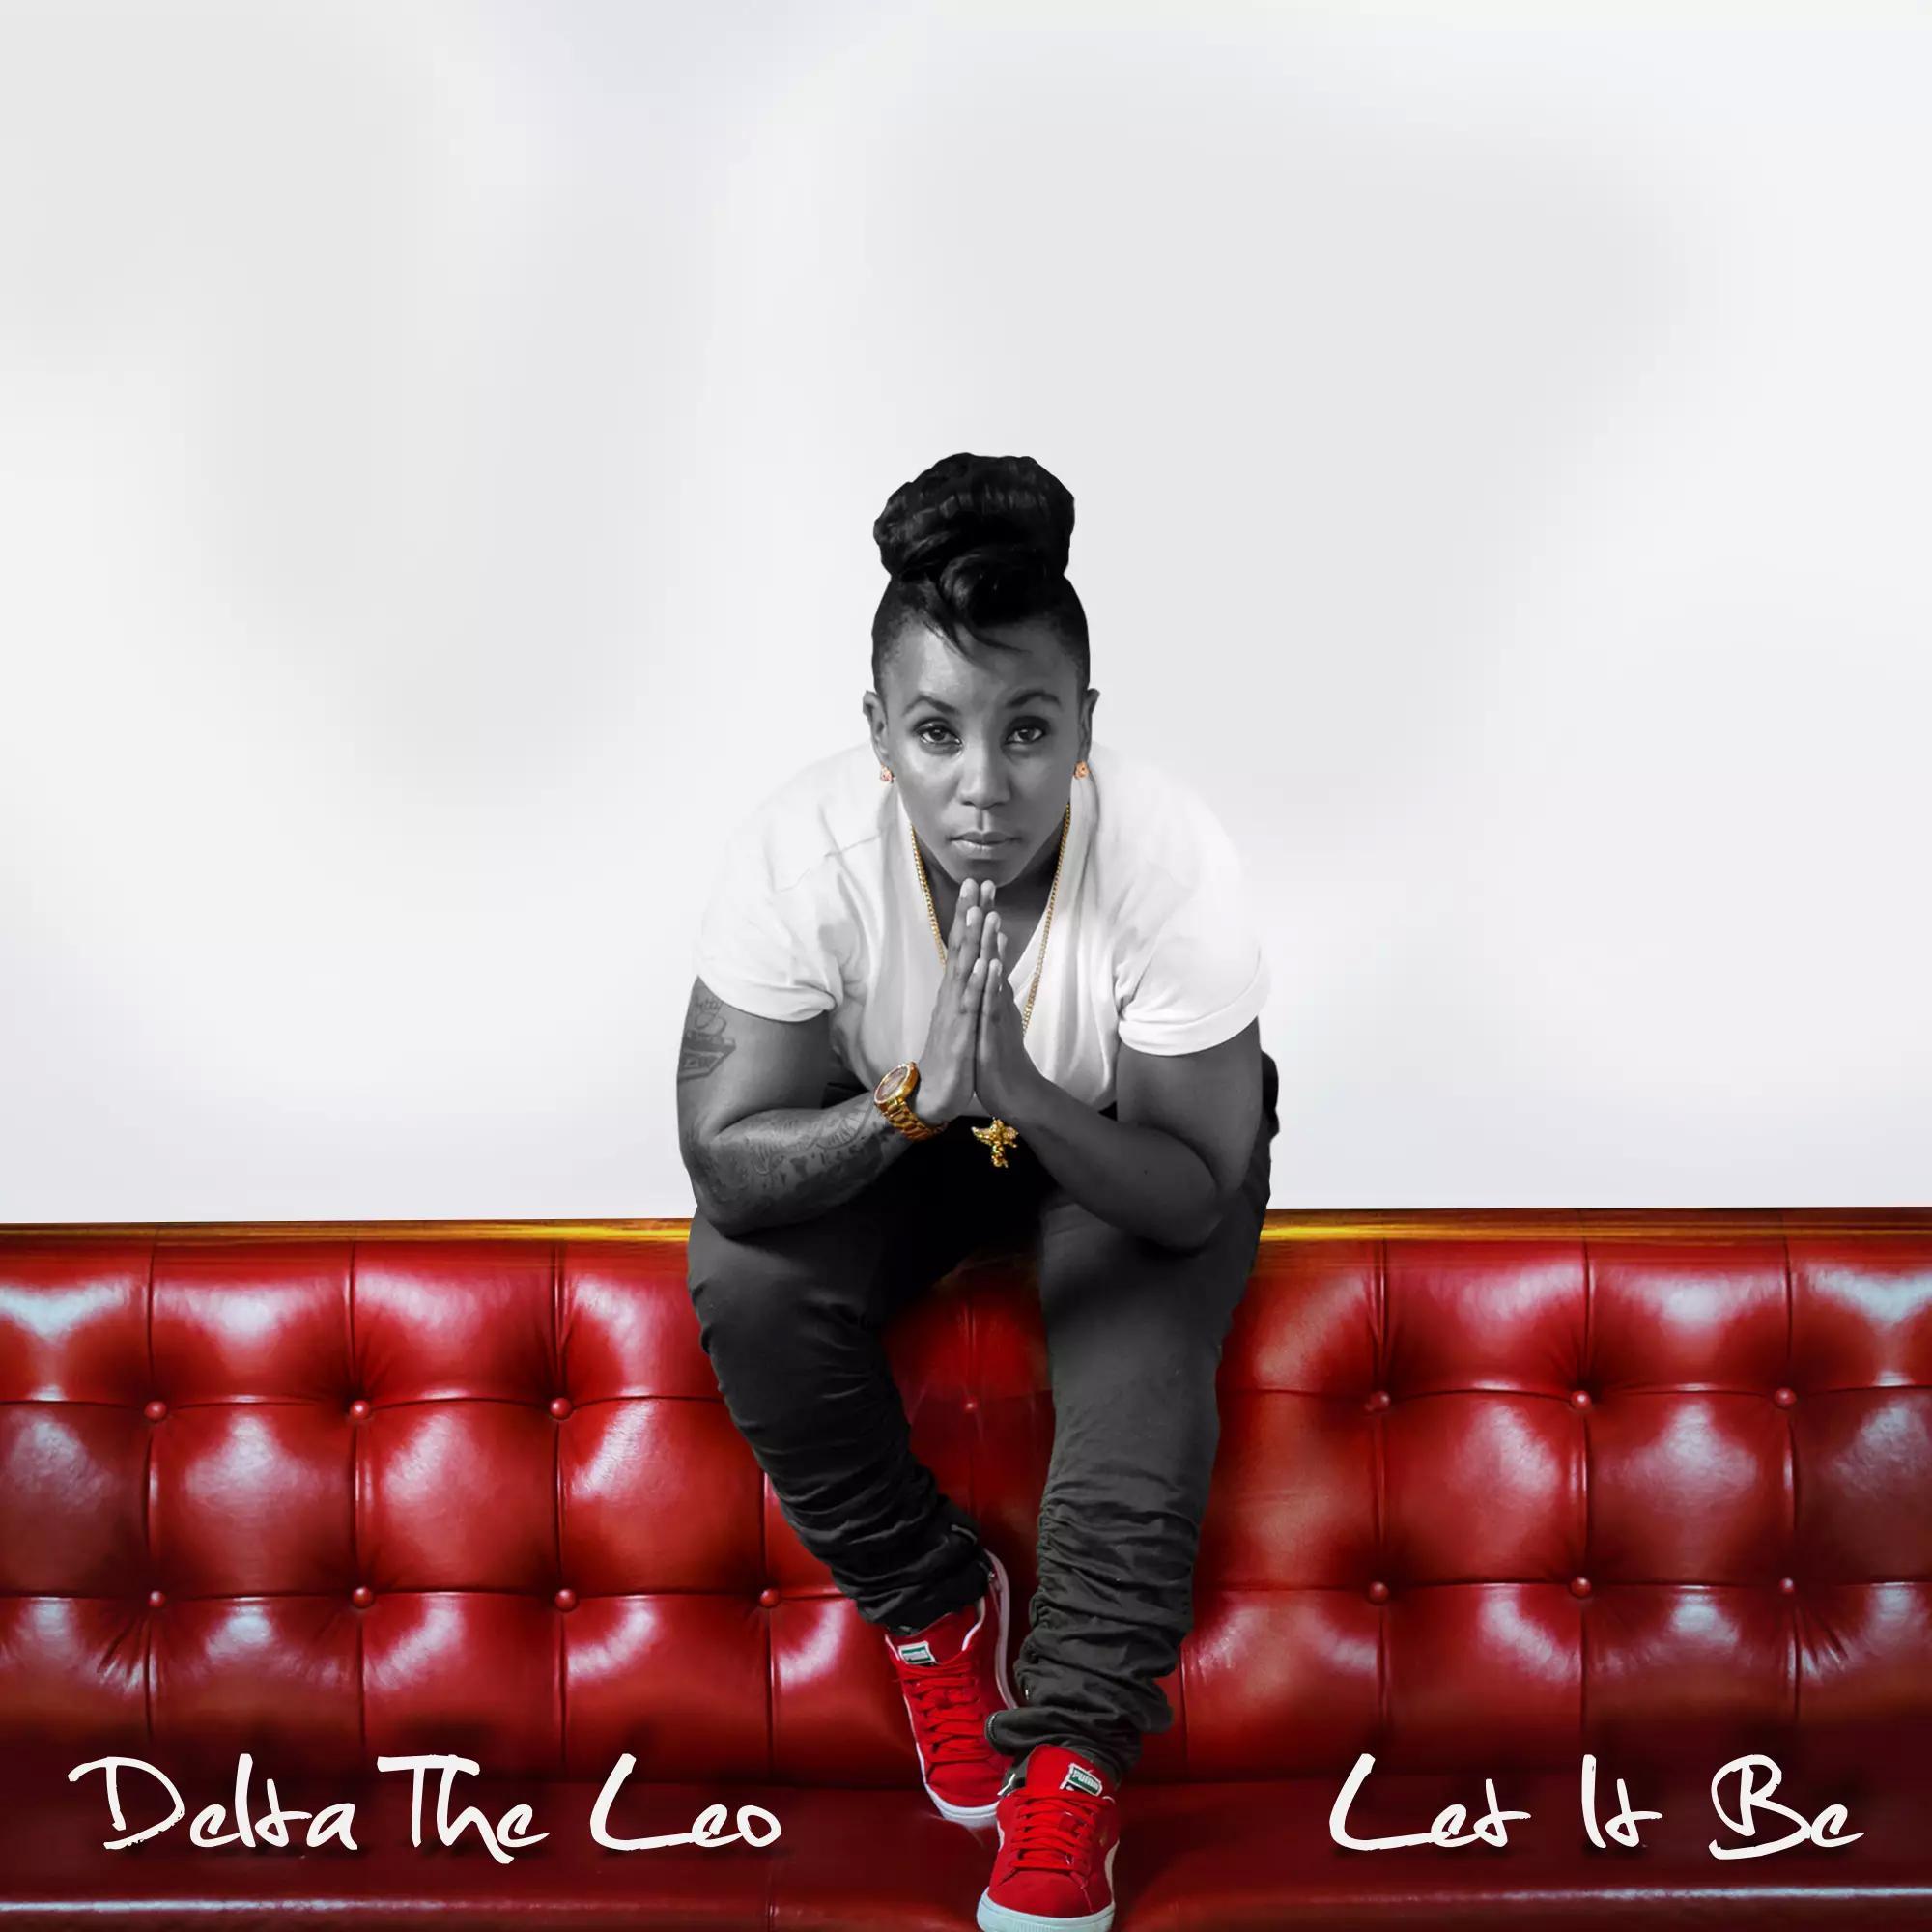 Delta-Let-it-Be-artwork